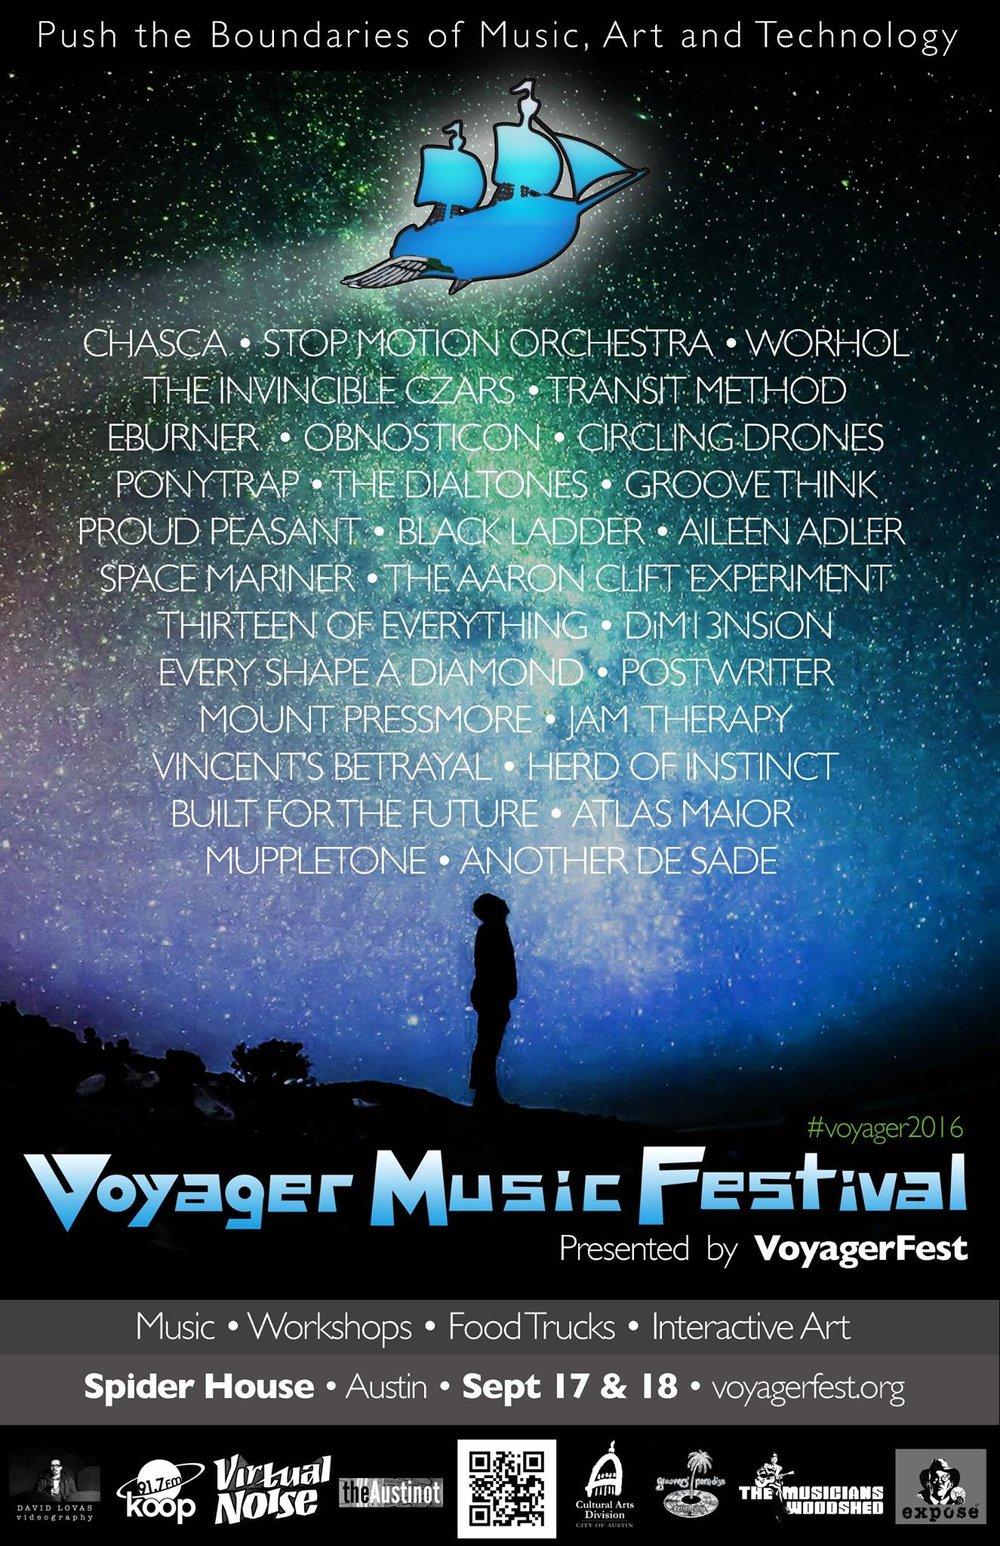 Voyager Music Festival 2016